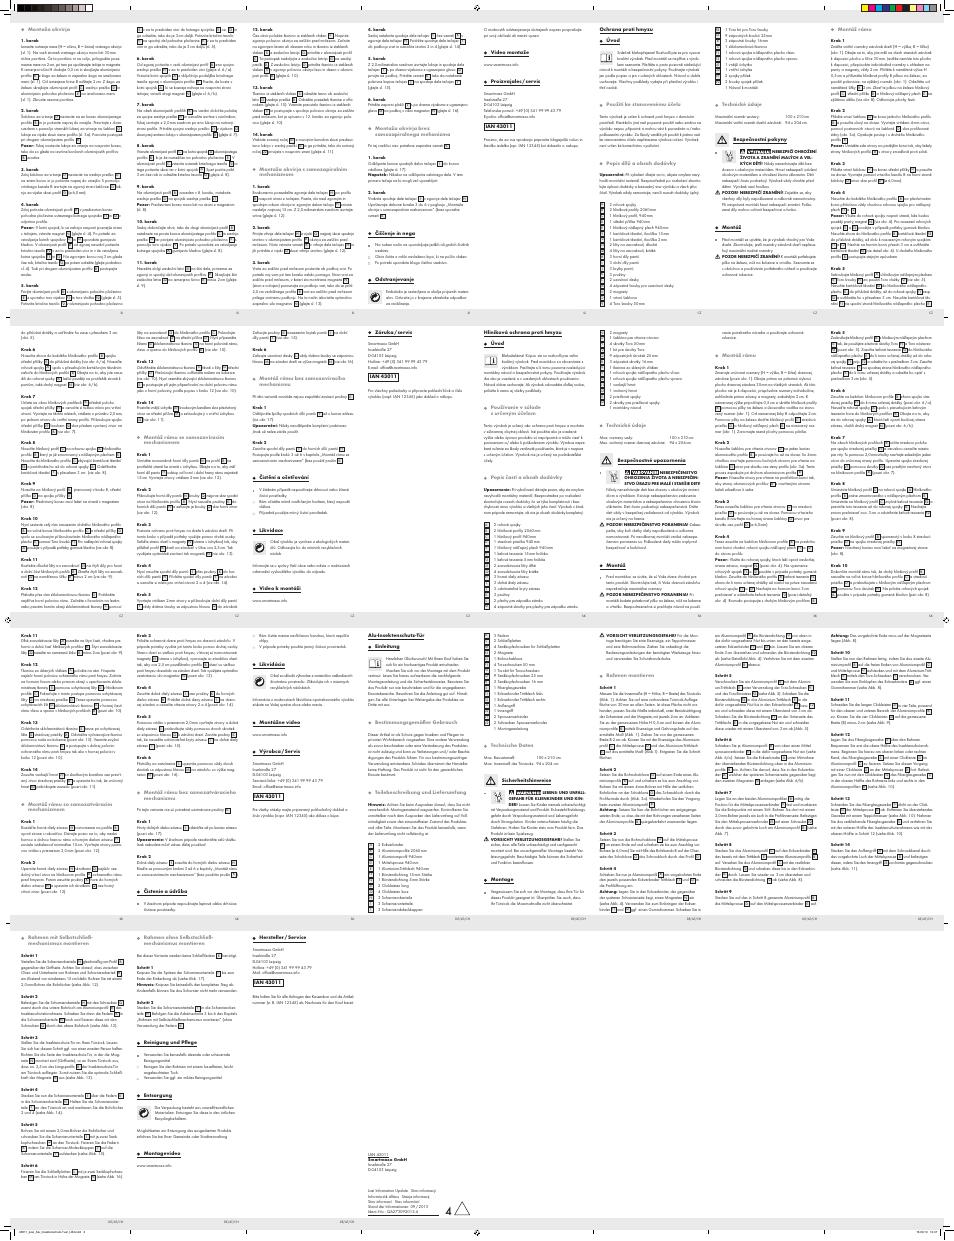 Powerfix Aluminium Insect Door Screen User Manual | Page 2 / 2